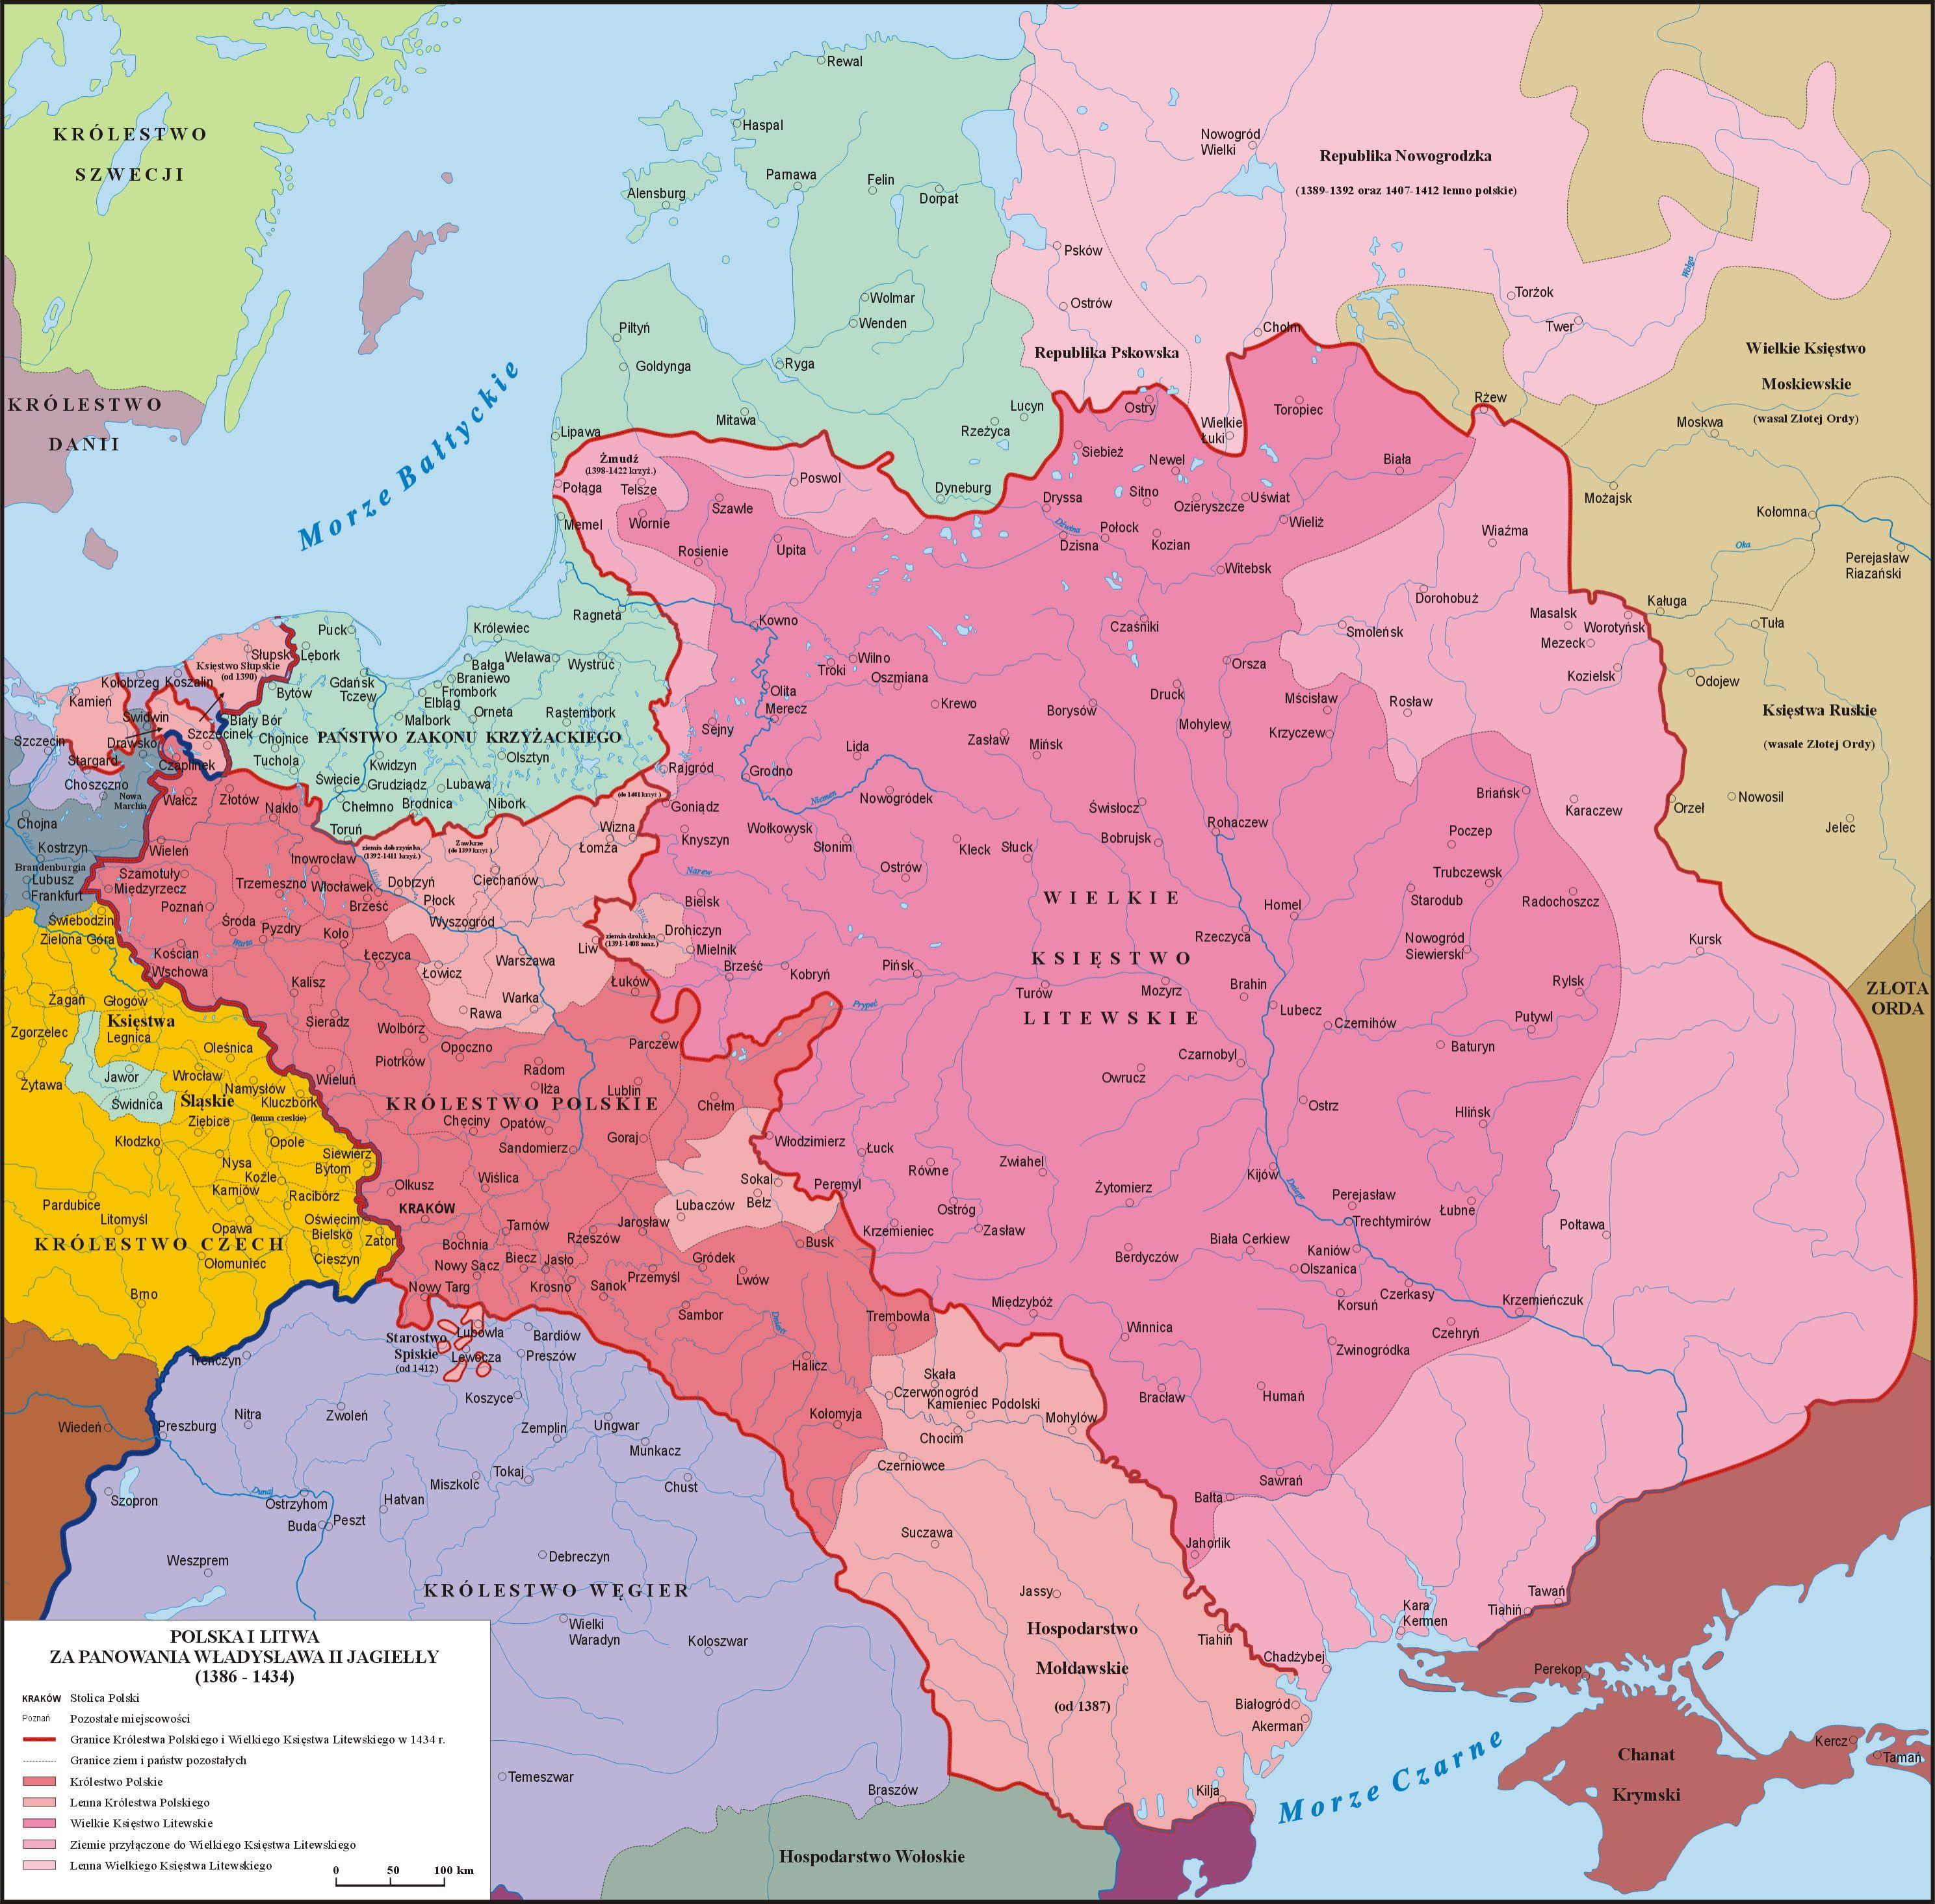 Jagiellonowie Wielka Dynastia Europy Mapa Polska Historia